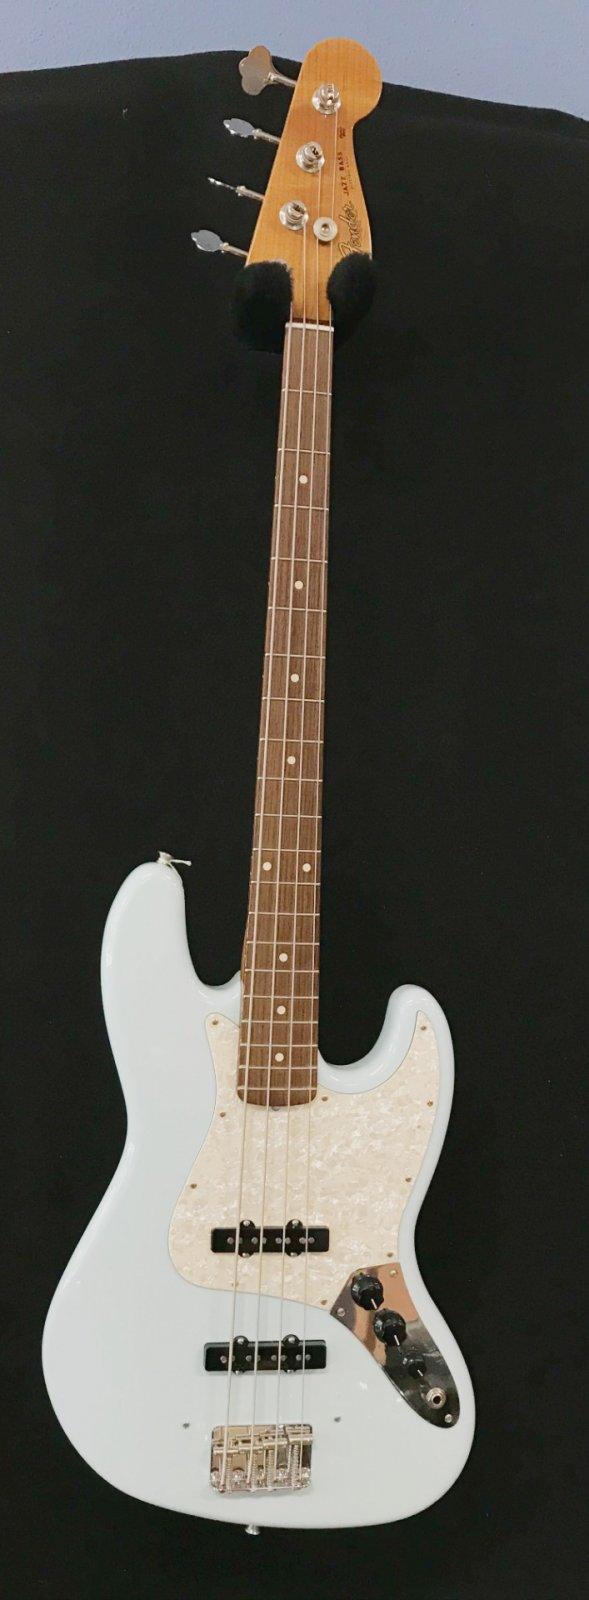 Used Fender NOS Custom Shop Jazz bass 64' RI